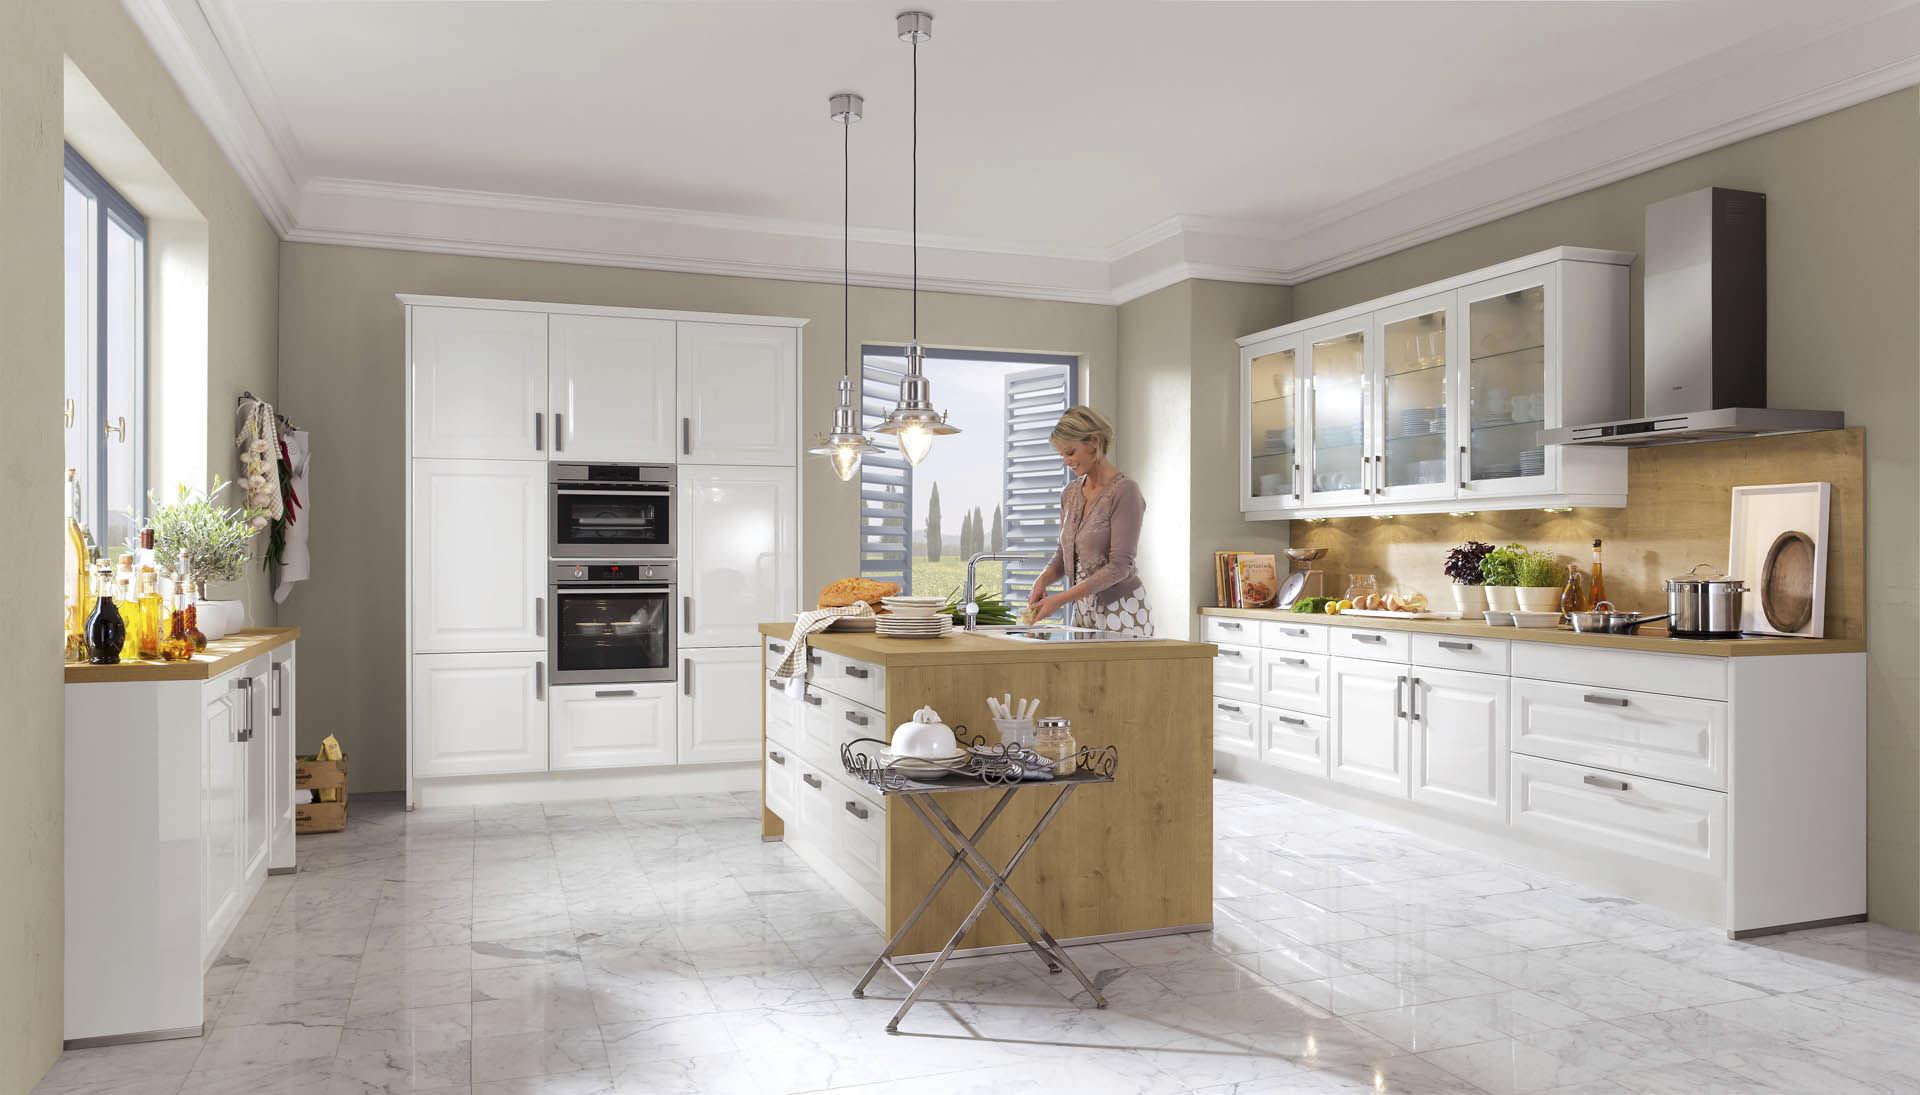 Moderne Küche / Holzfurnier / lackiert - DIAMOND 909 - nobilia